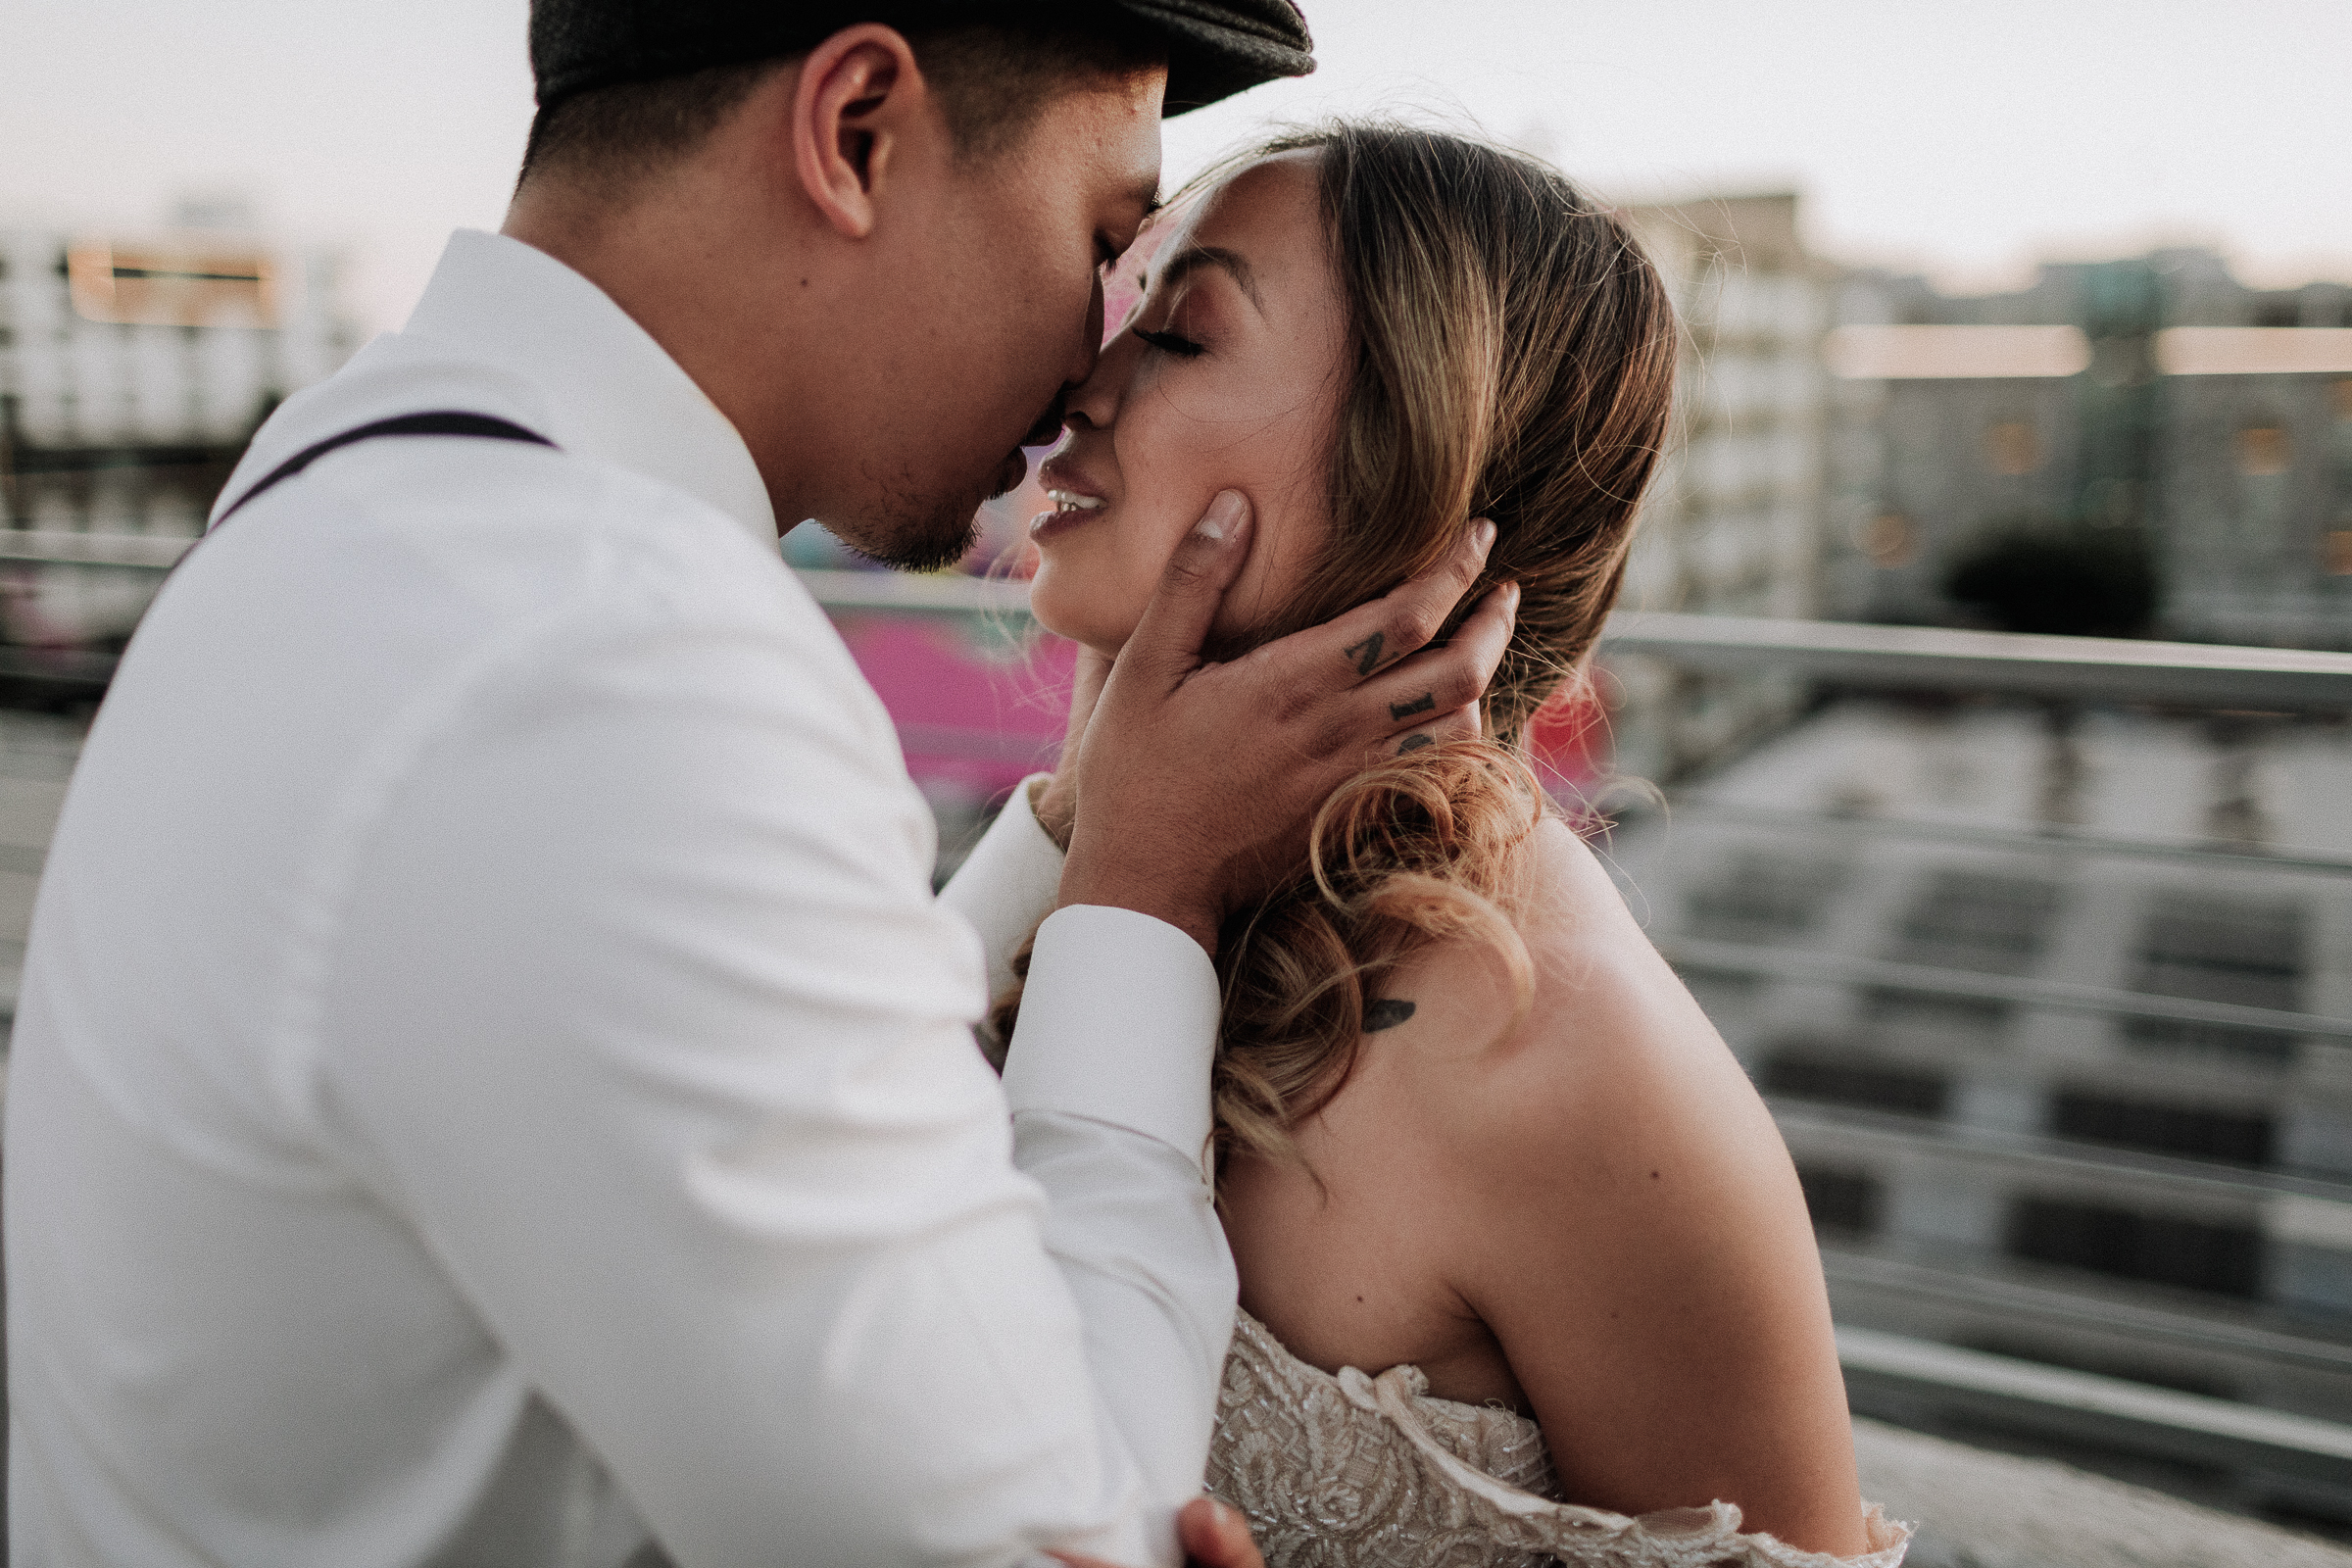 Gretchen Gause Photography | Los Angeles Hudson Loft Wedding #hudsonloft #laweddingphotographer #DTLA #weddingplanning #romanticwedding #brideandgroom #caweddingphotographer #weddingphotography